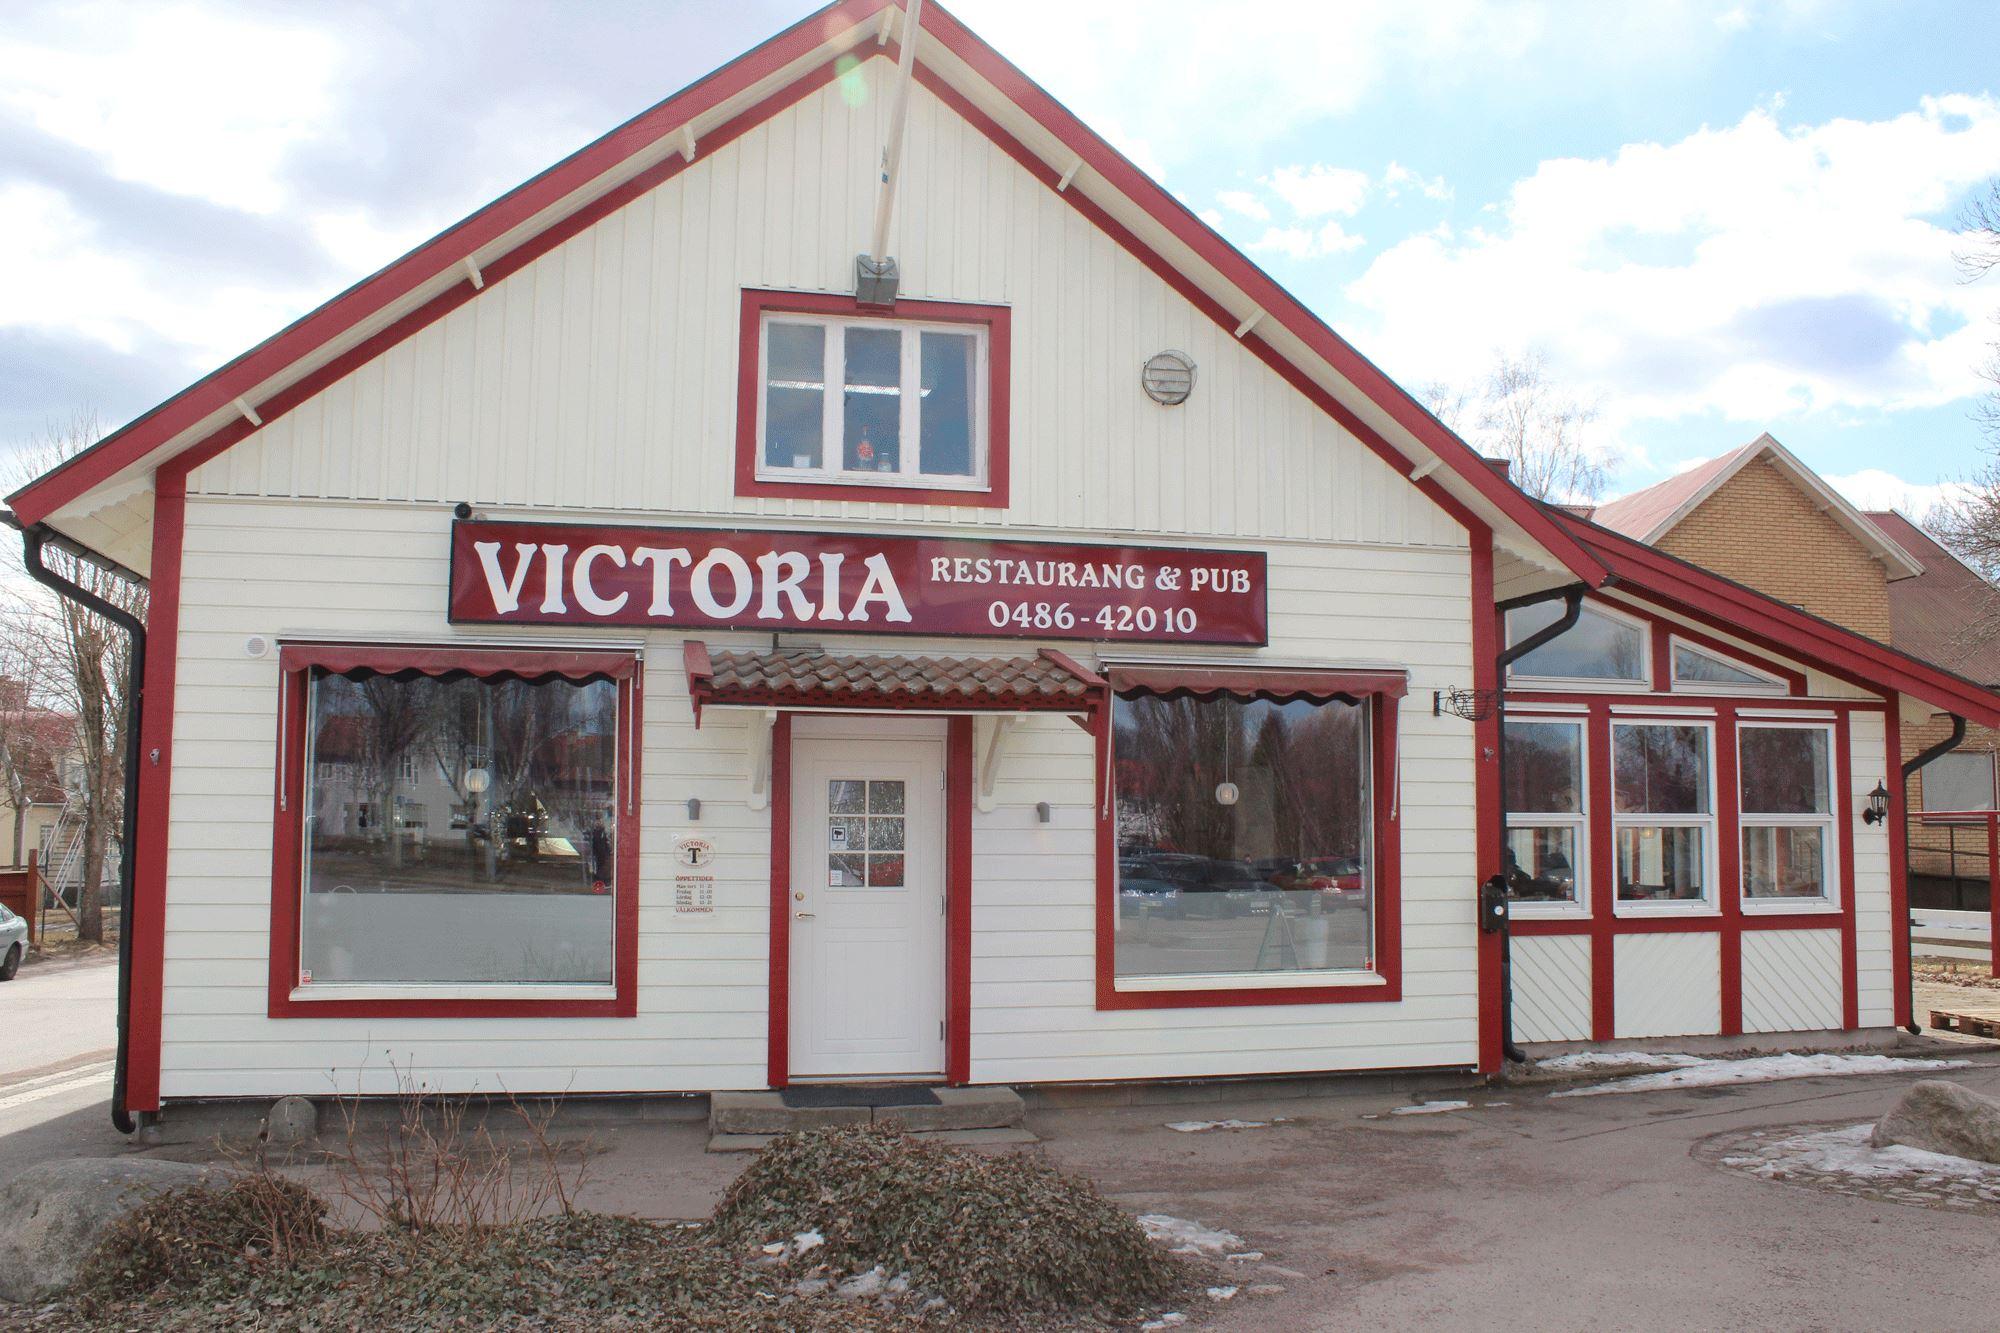 Victoria restaurang